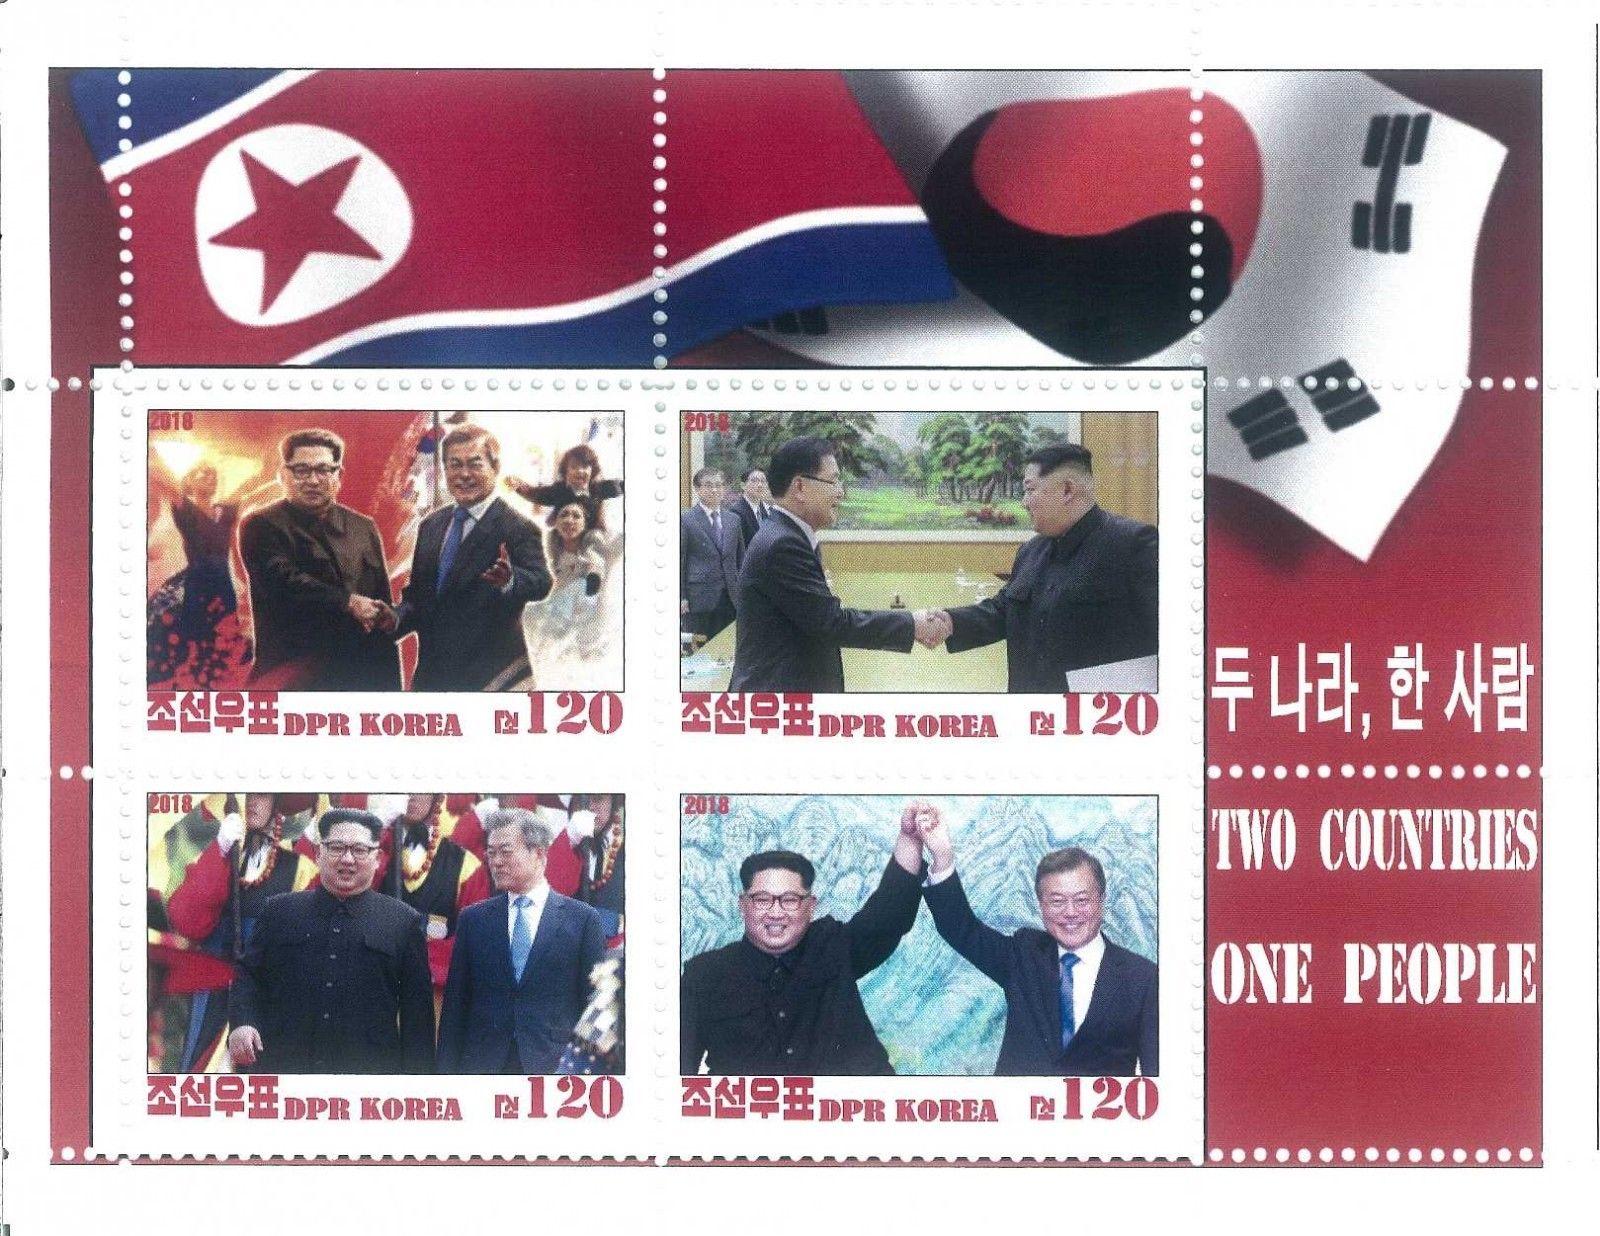 f the Korean Demilitarized Zone (DMZ)